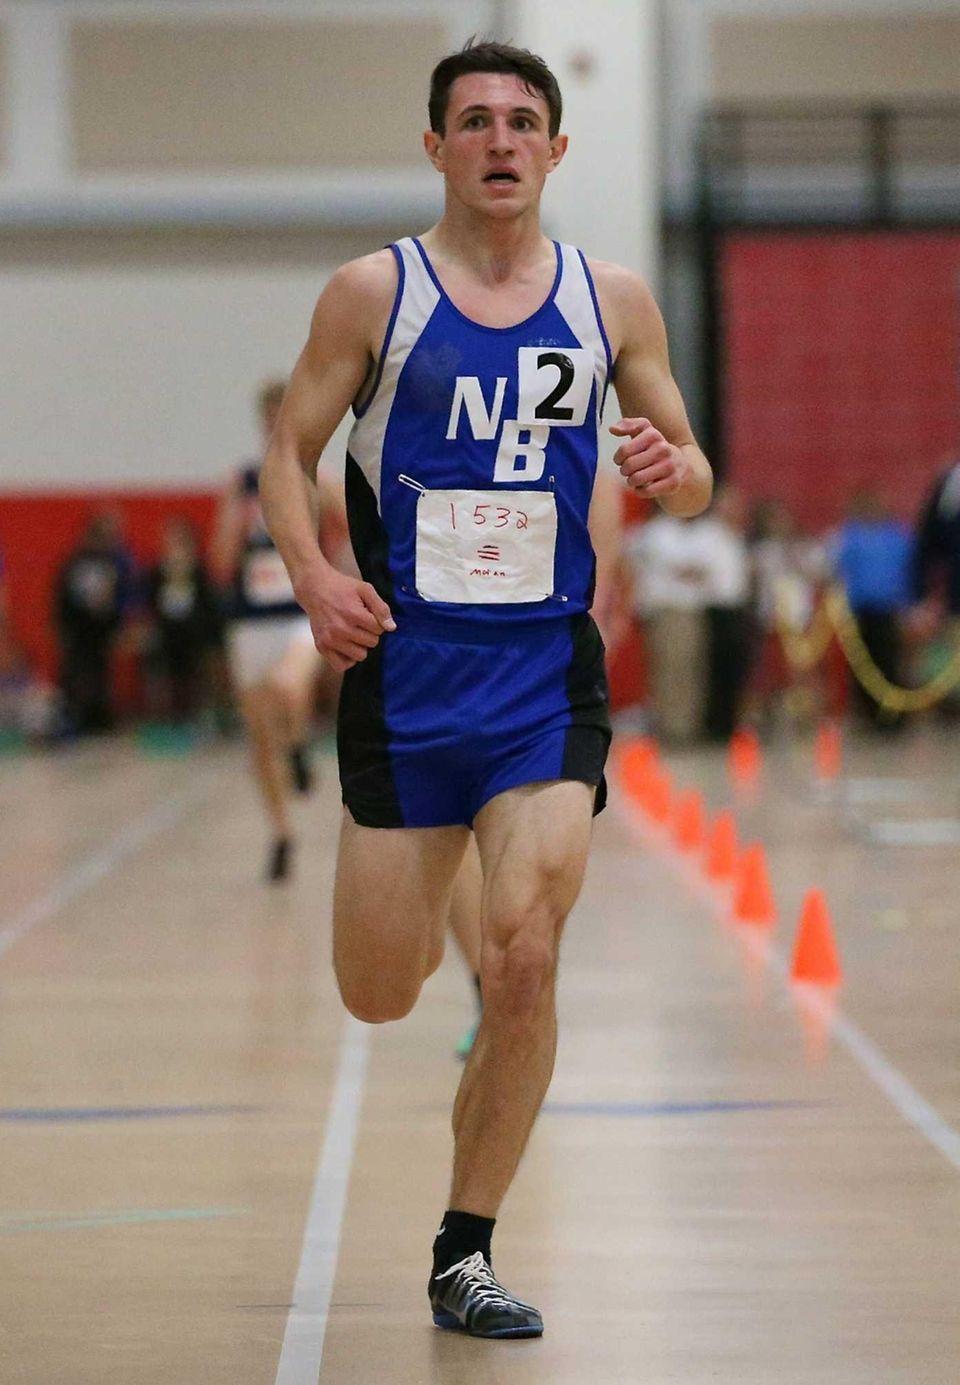 North Babylon's Kris Moran wins the boys 3200